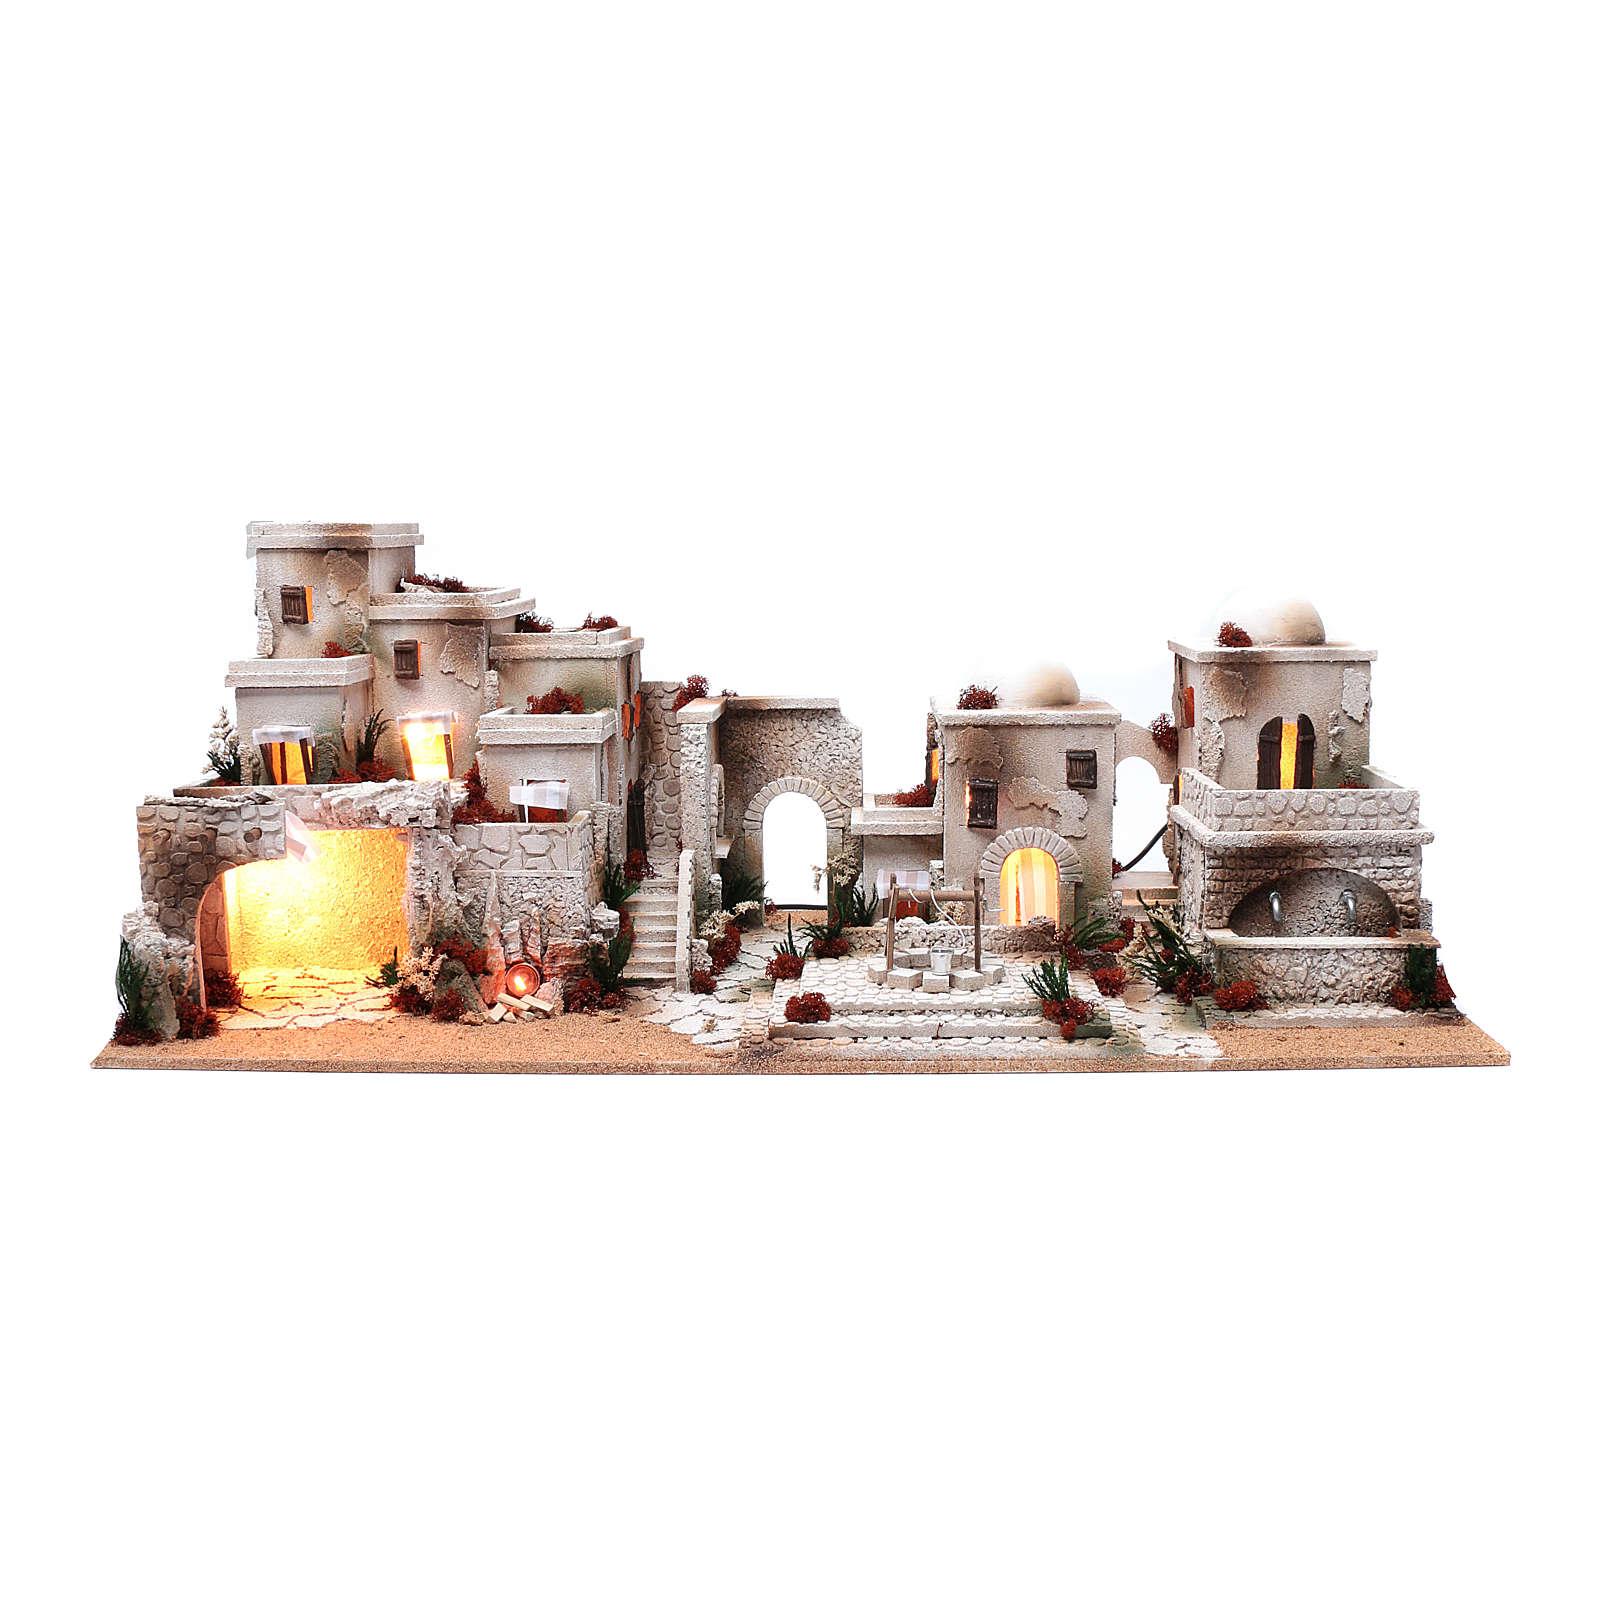 Arabian nativity scene setting  35x95x45 cm with lights and fountain 4